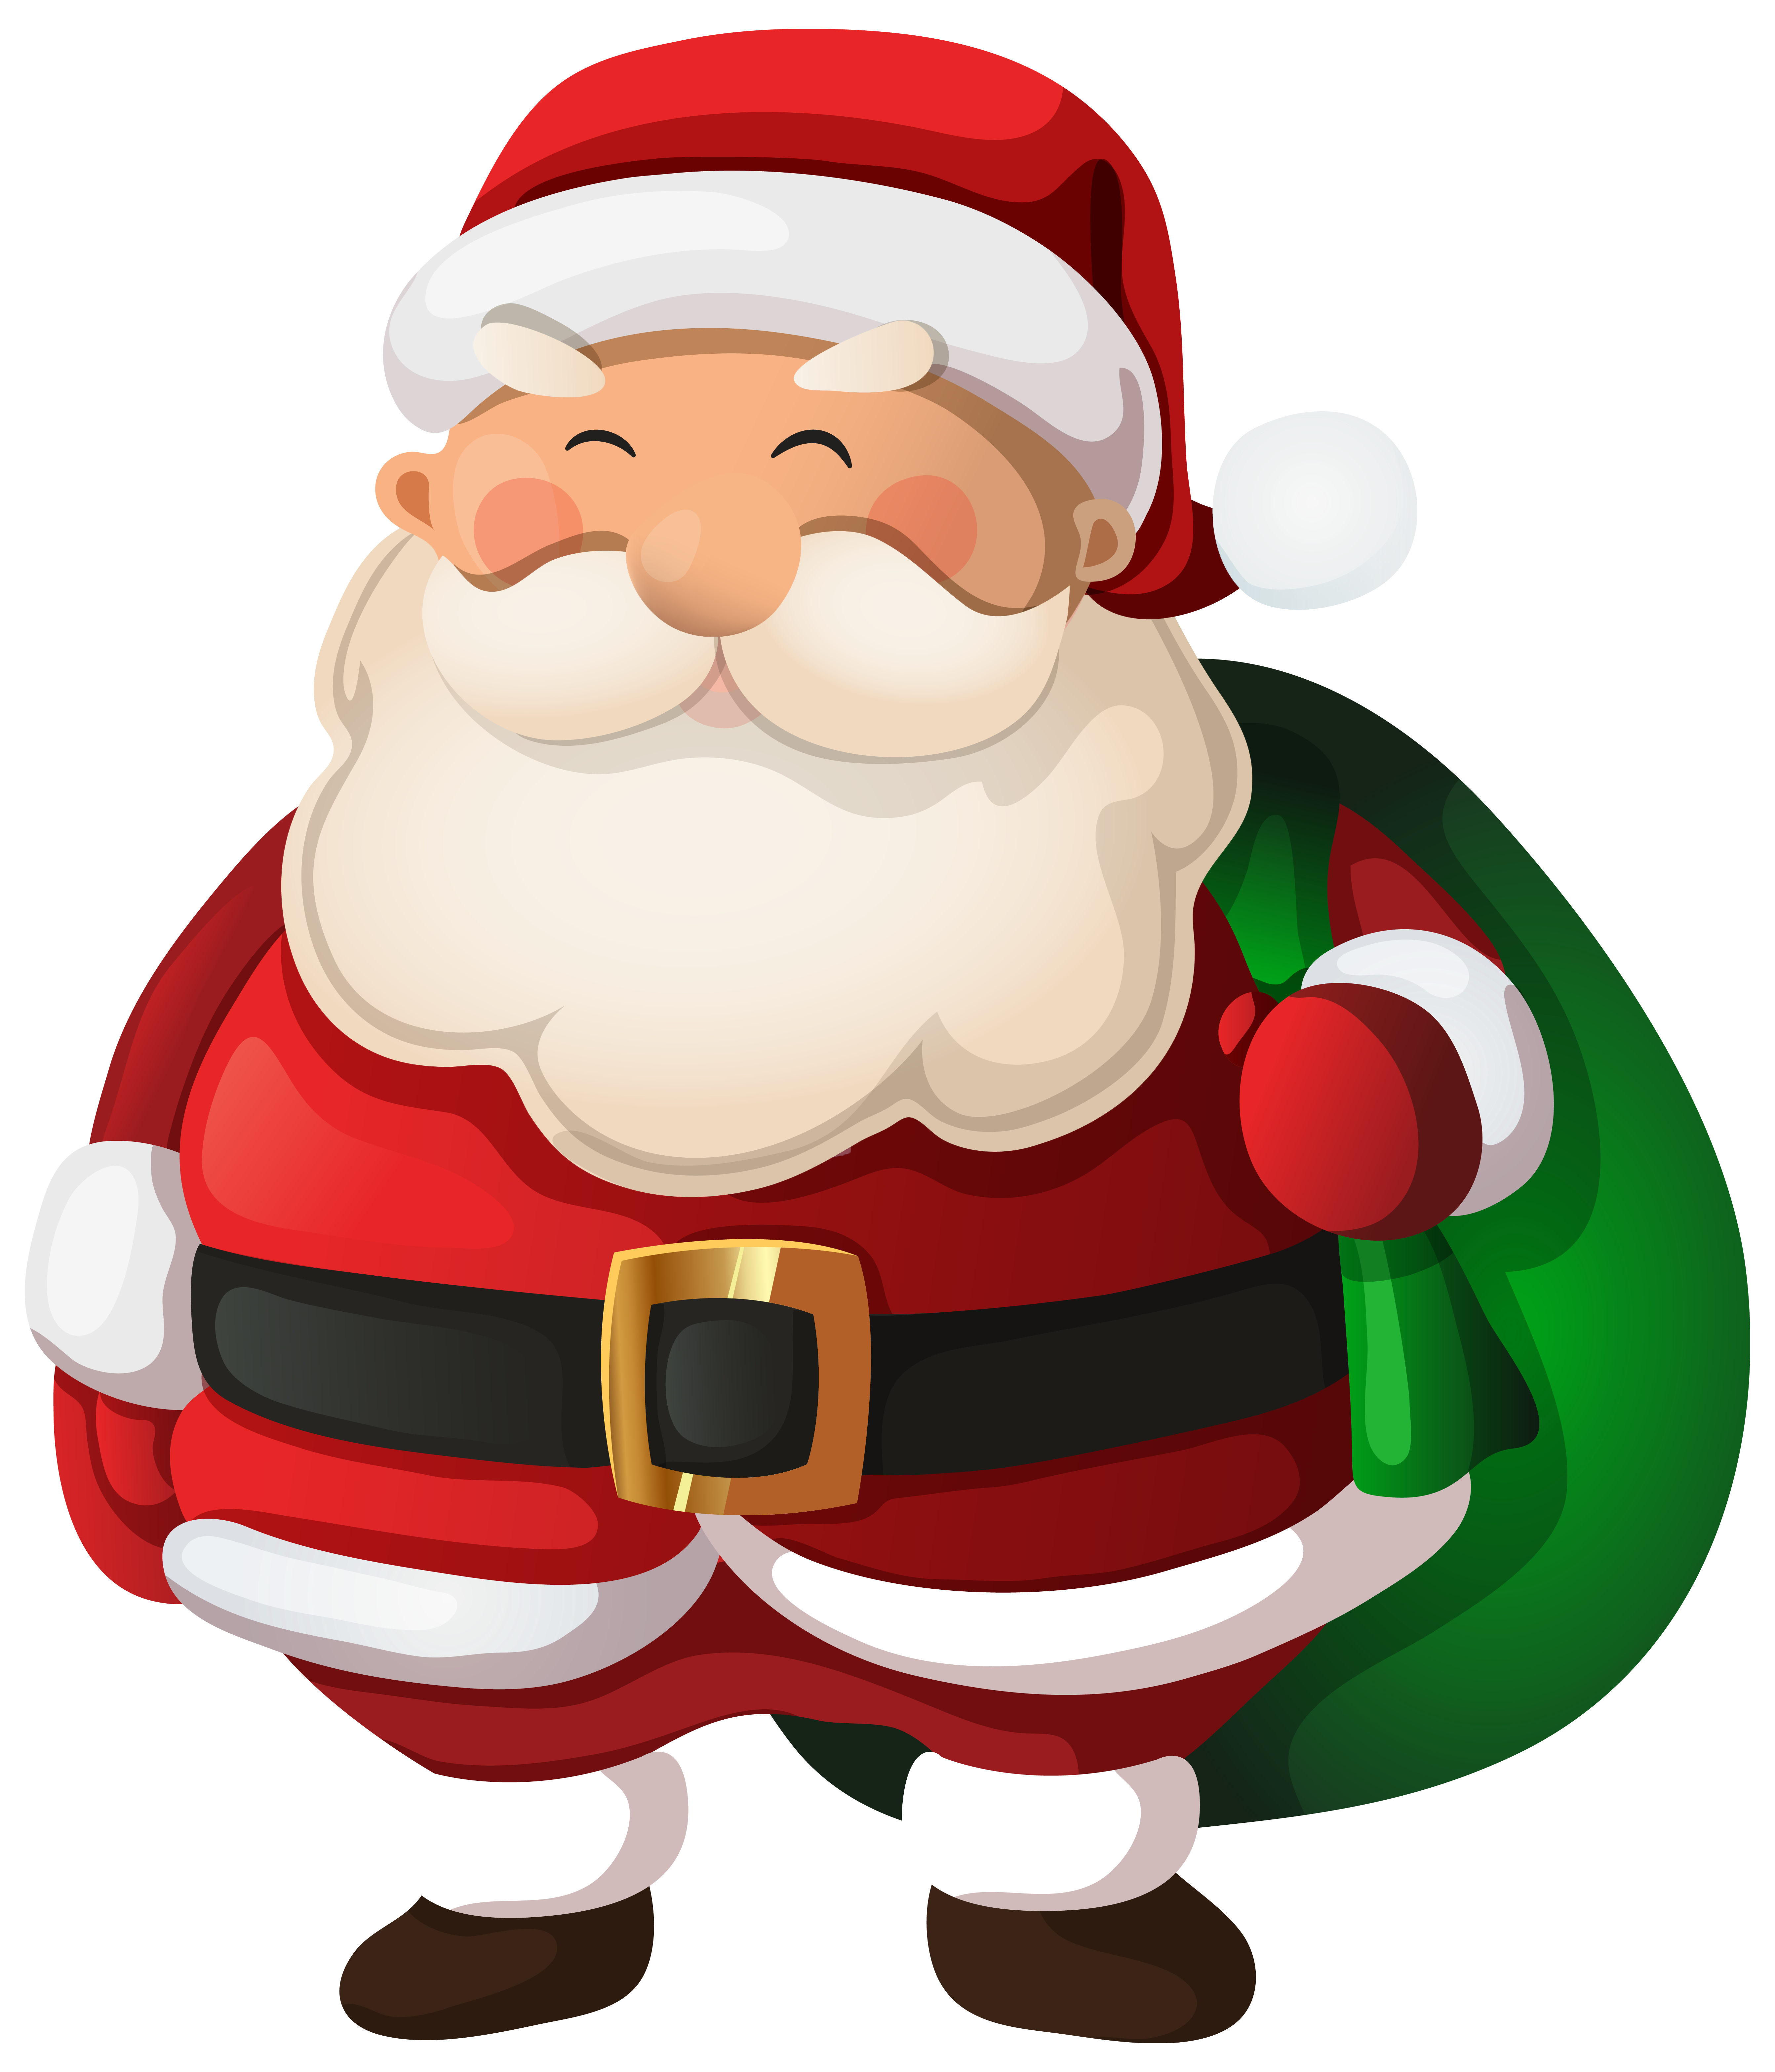 Santa claus clip art clipart. View full size ?